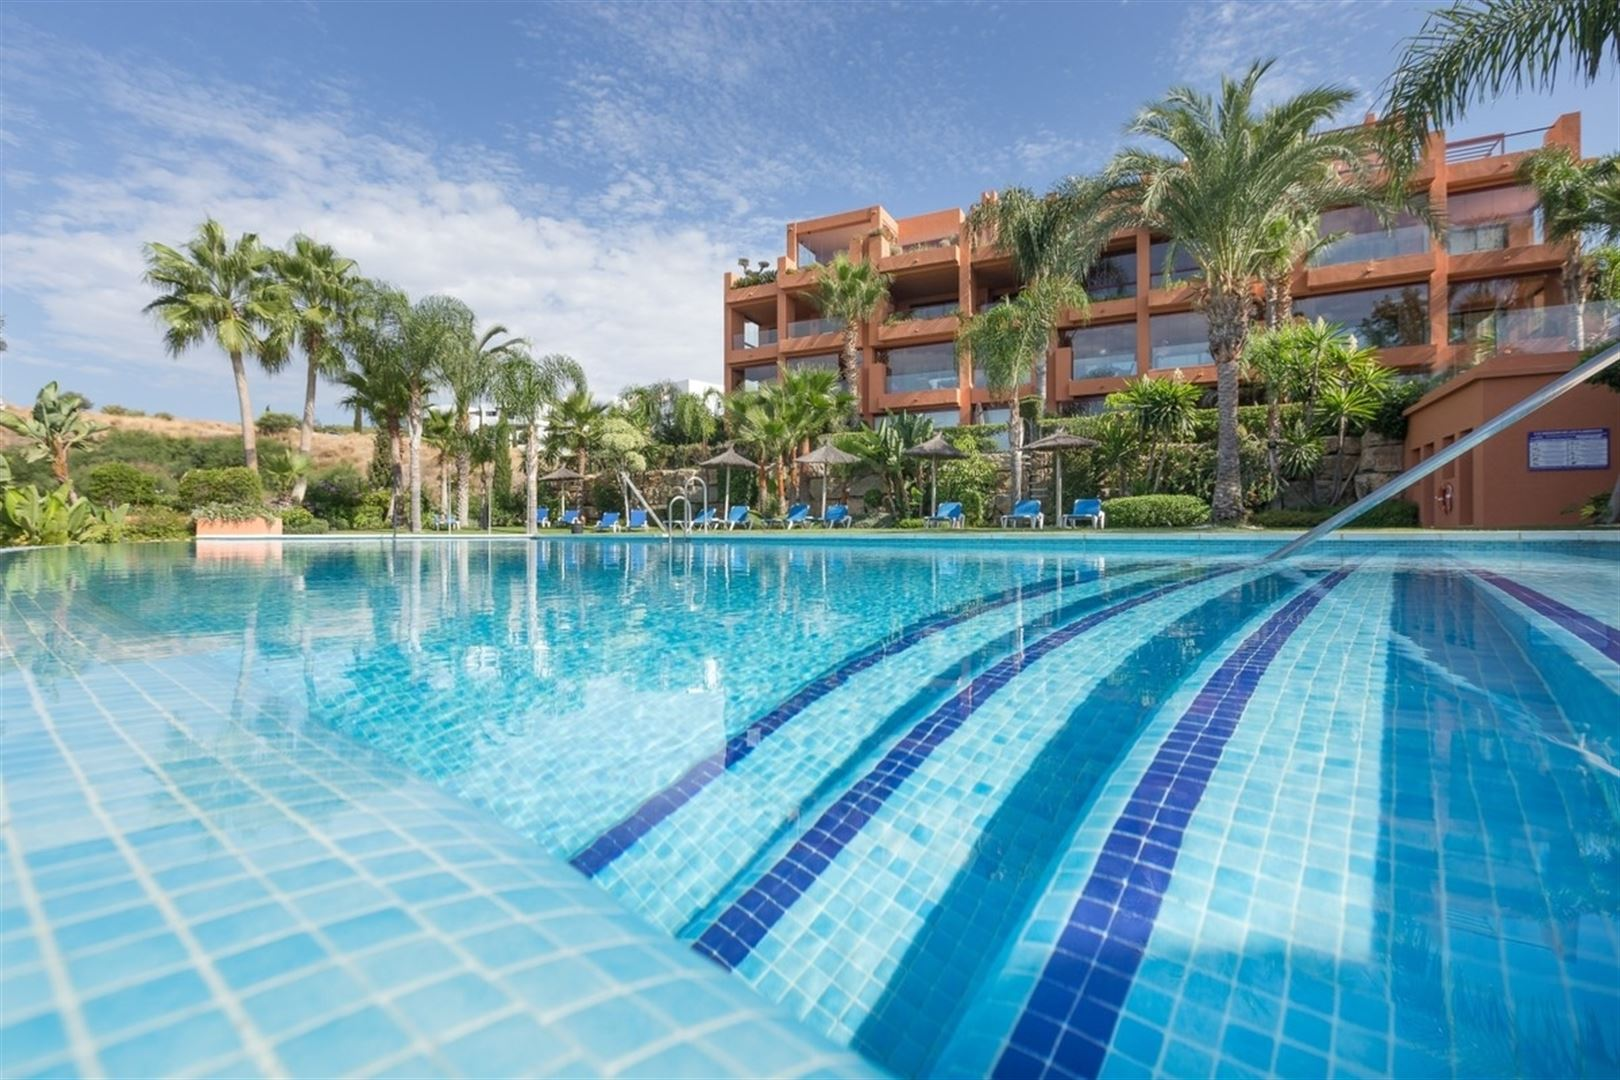 Foto 26 : Appartement te 29679 MARBELLA (Spanje) - Prijs € 1.750